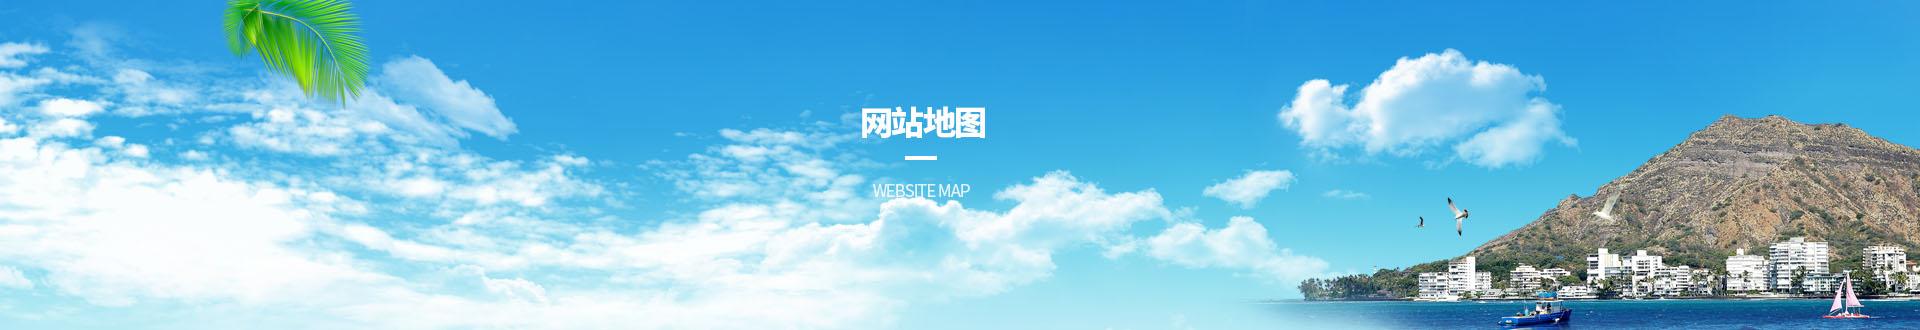 pc网站地图banner